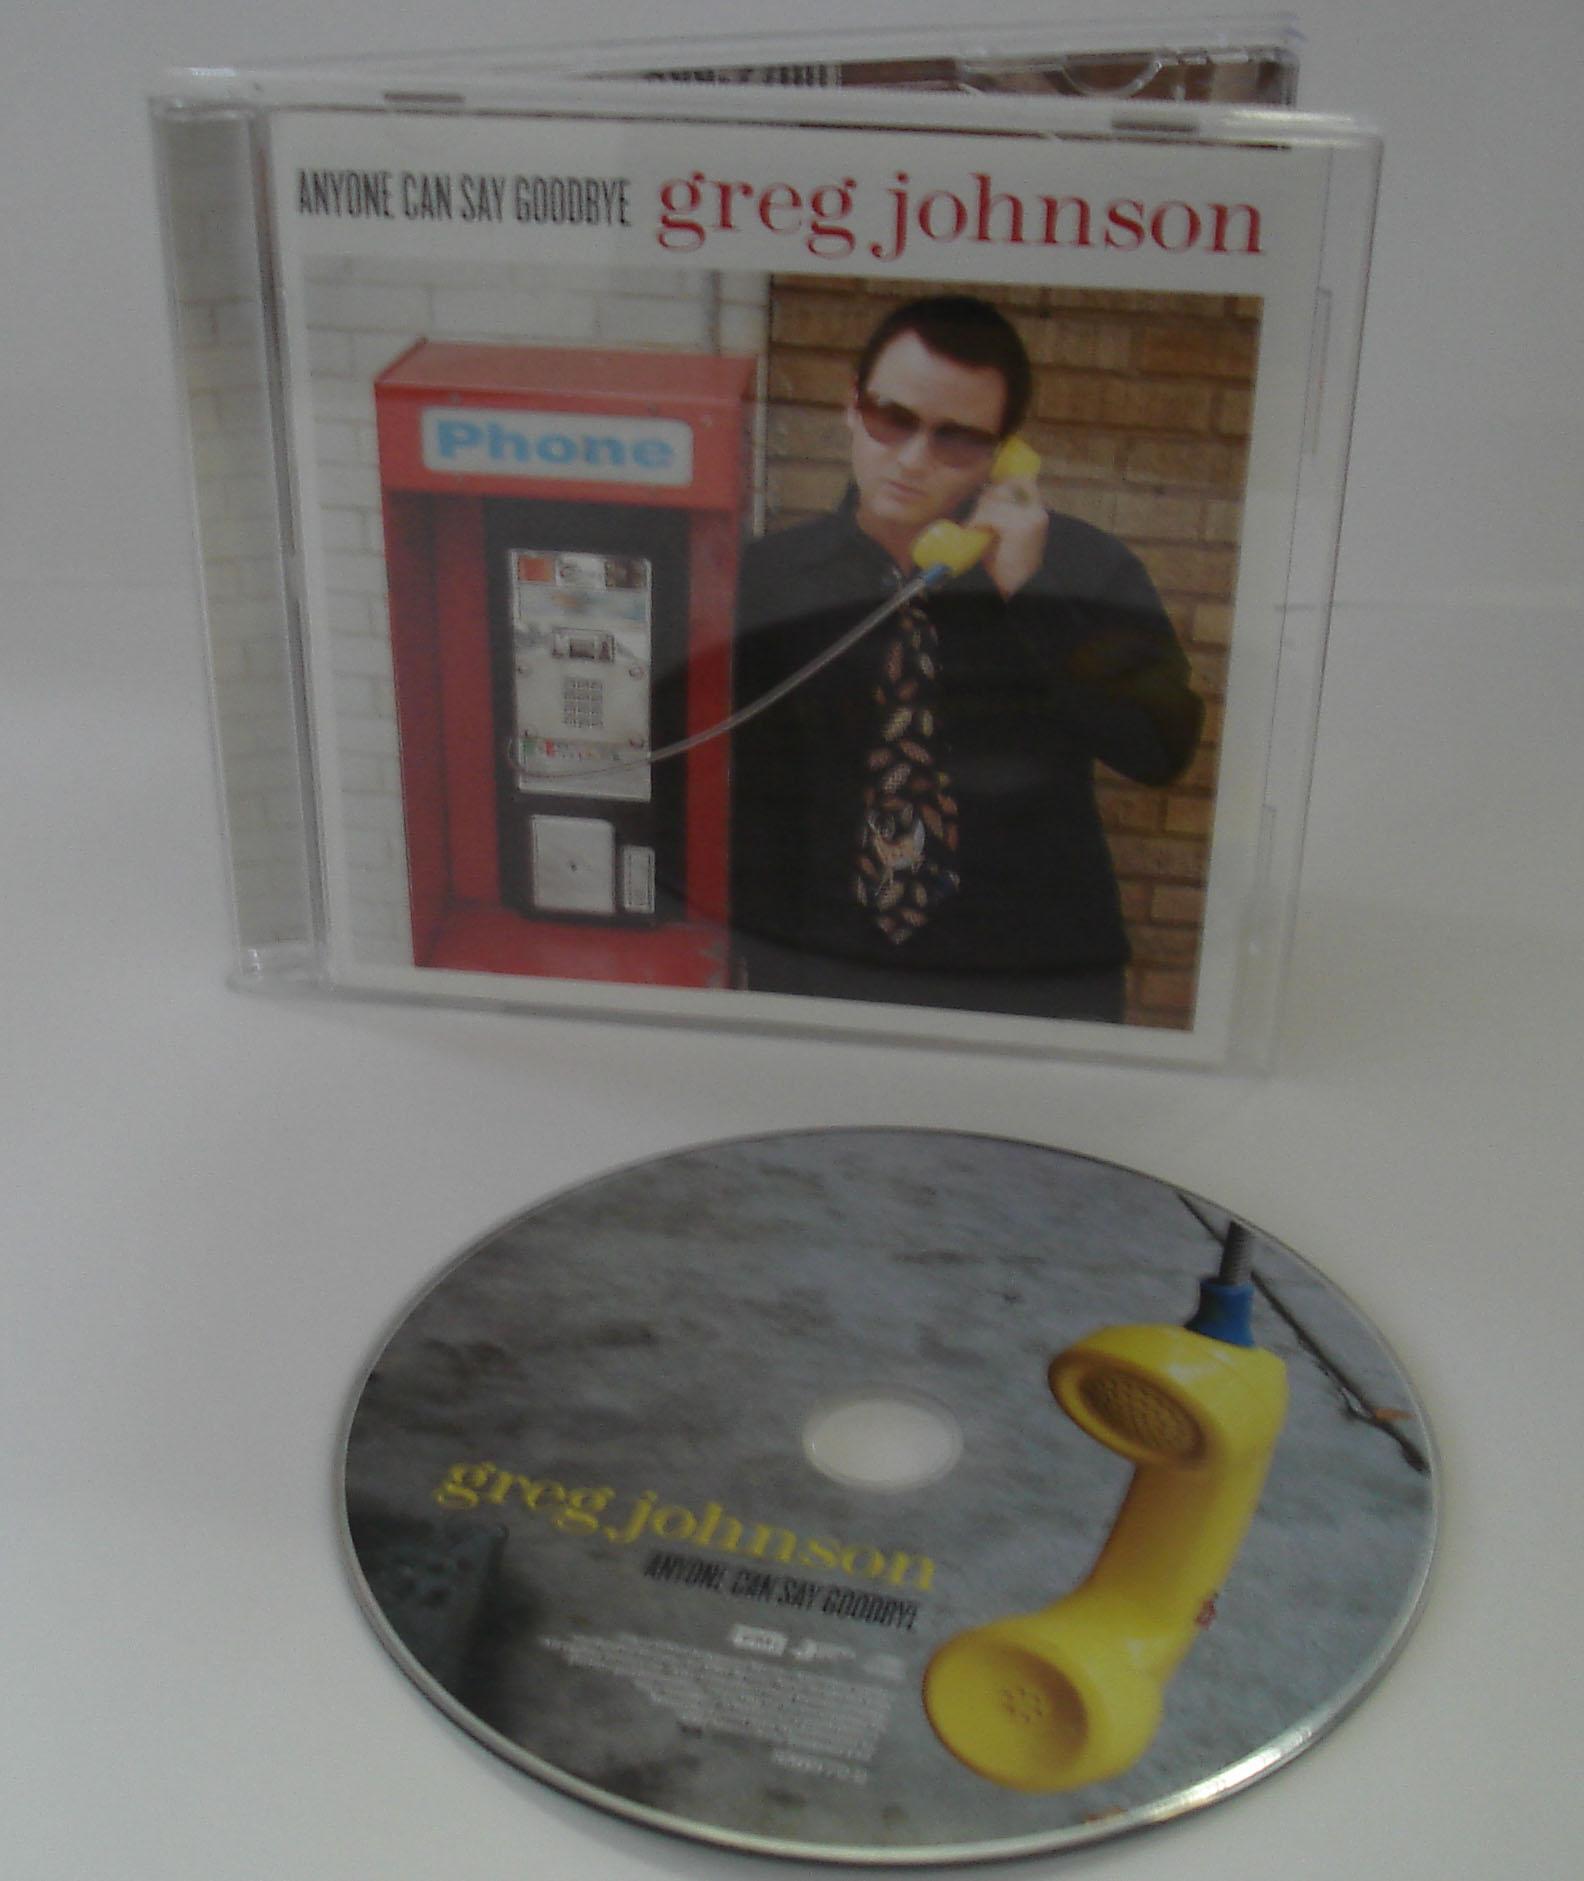 GREG JOHNSON - ANYONE CAN SAY GOODBYE - ALBUM